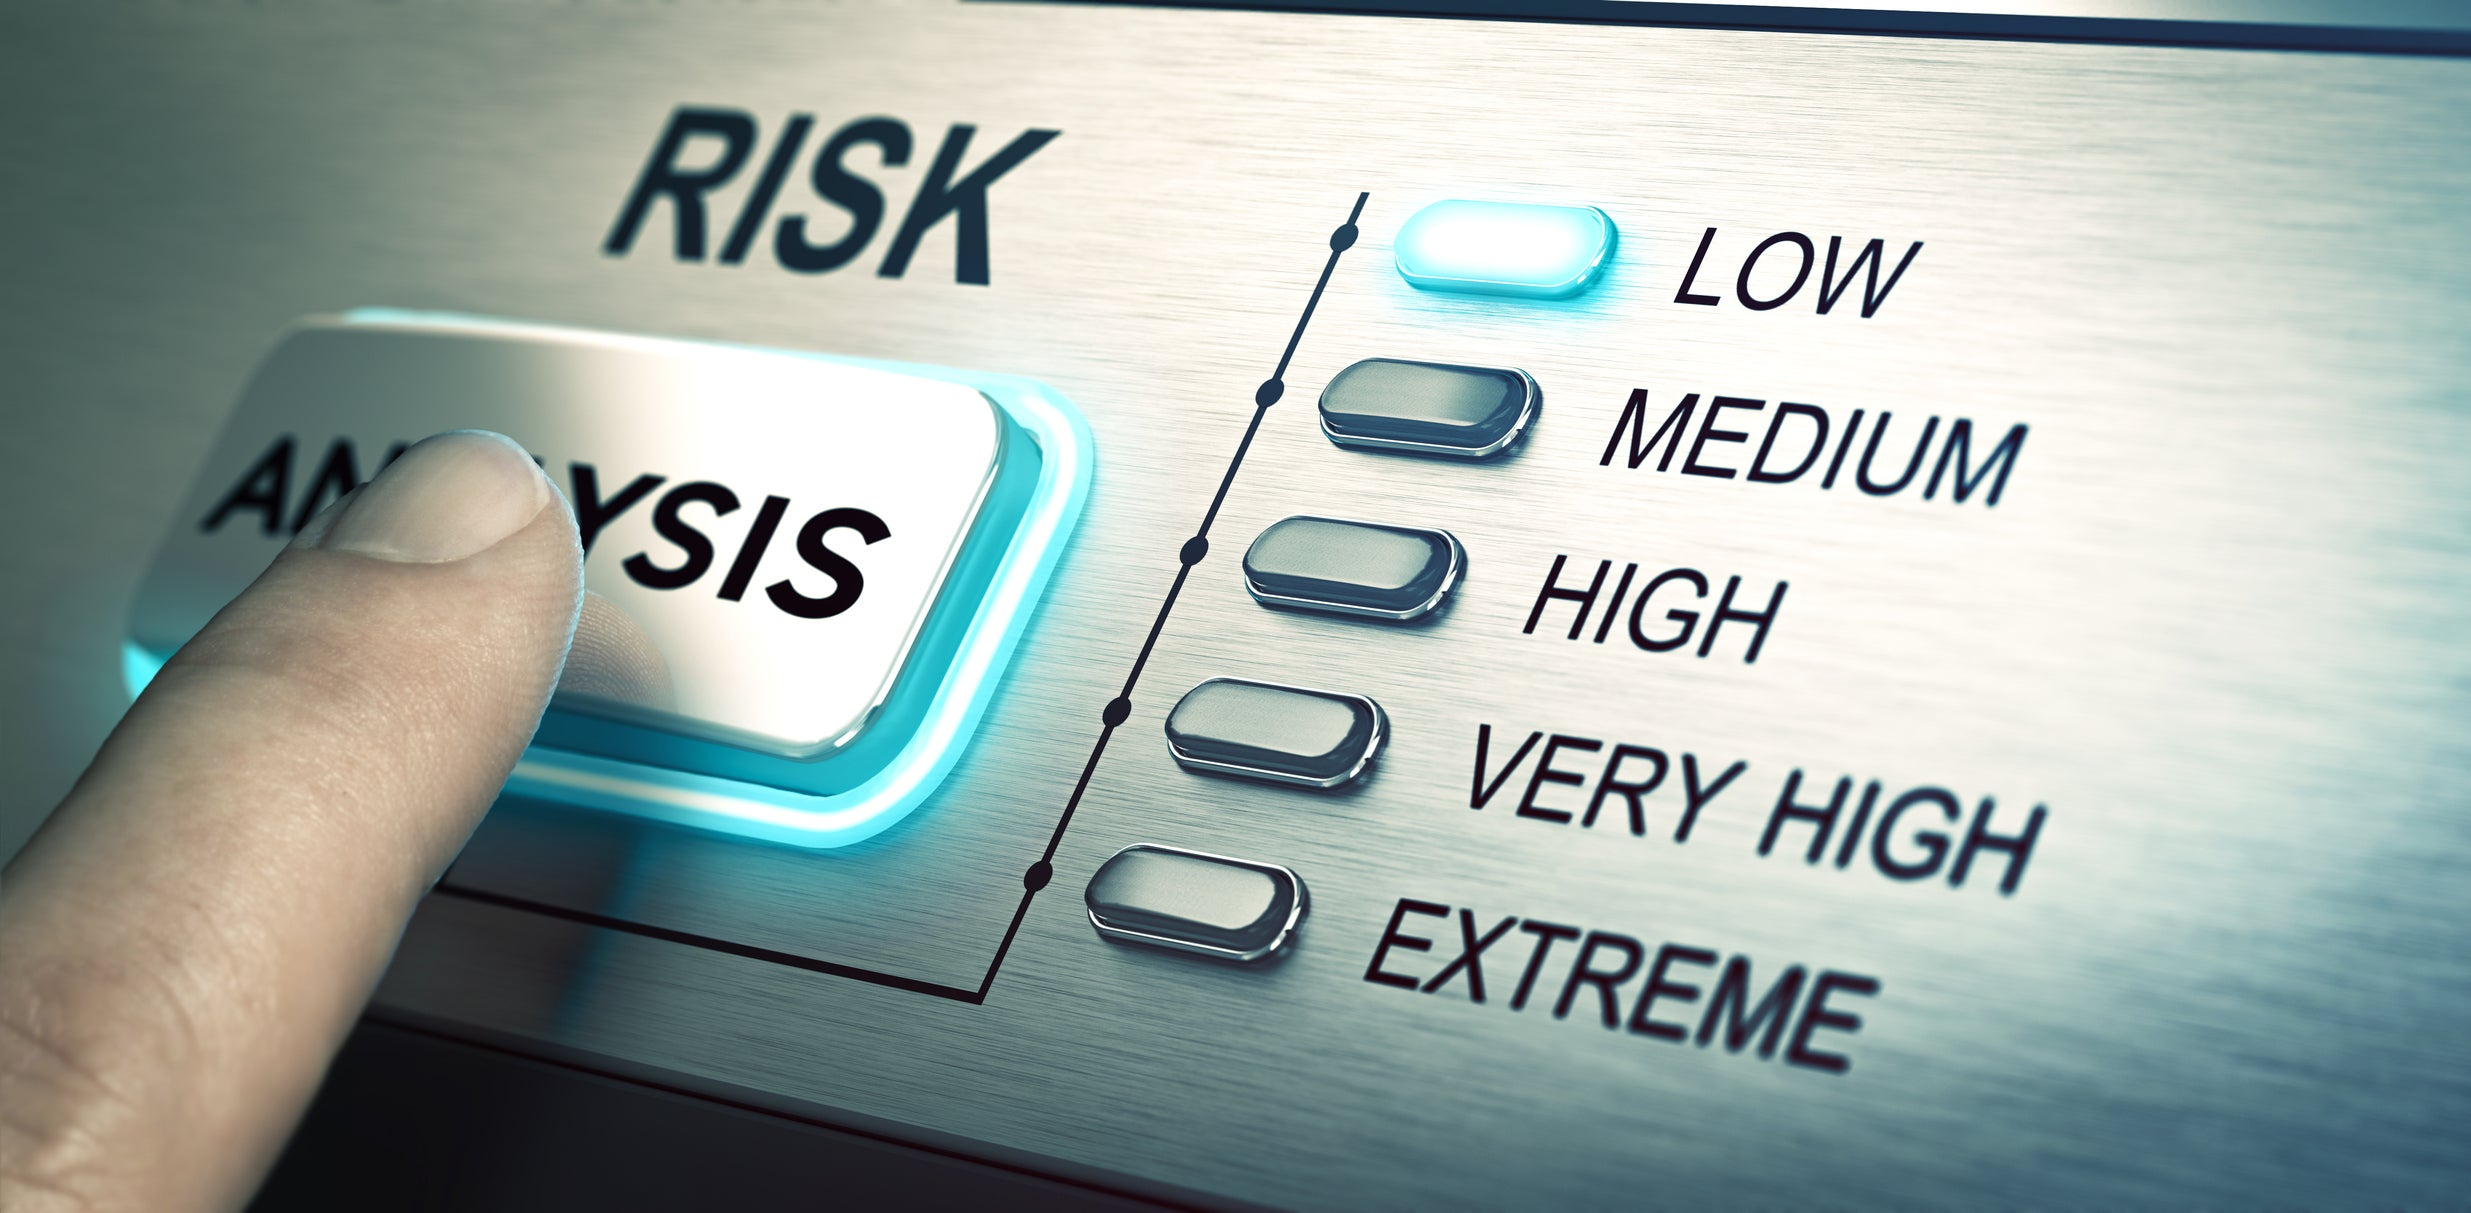 3 Great Stocks For Low Risk Investors